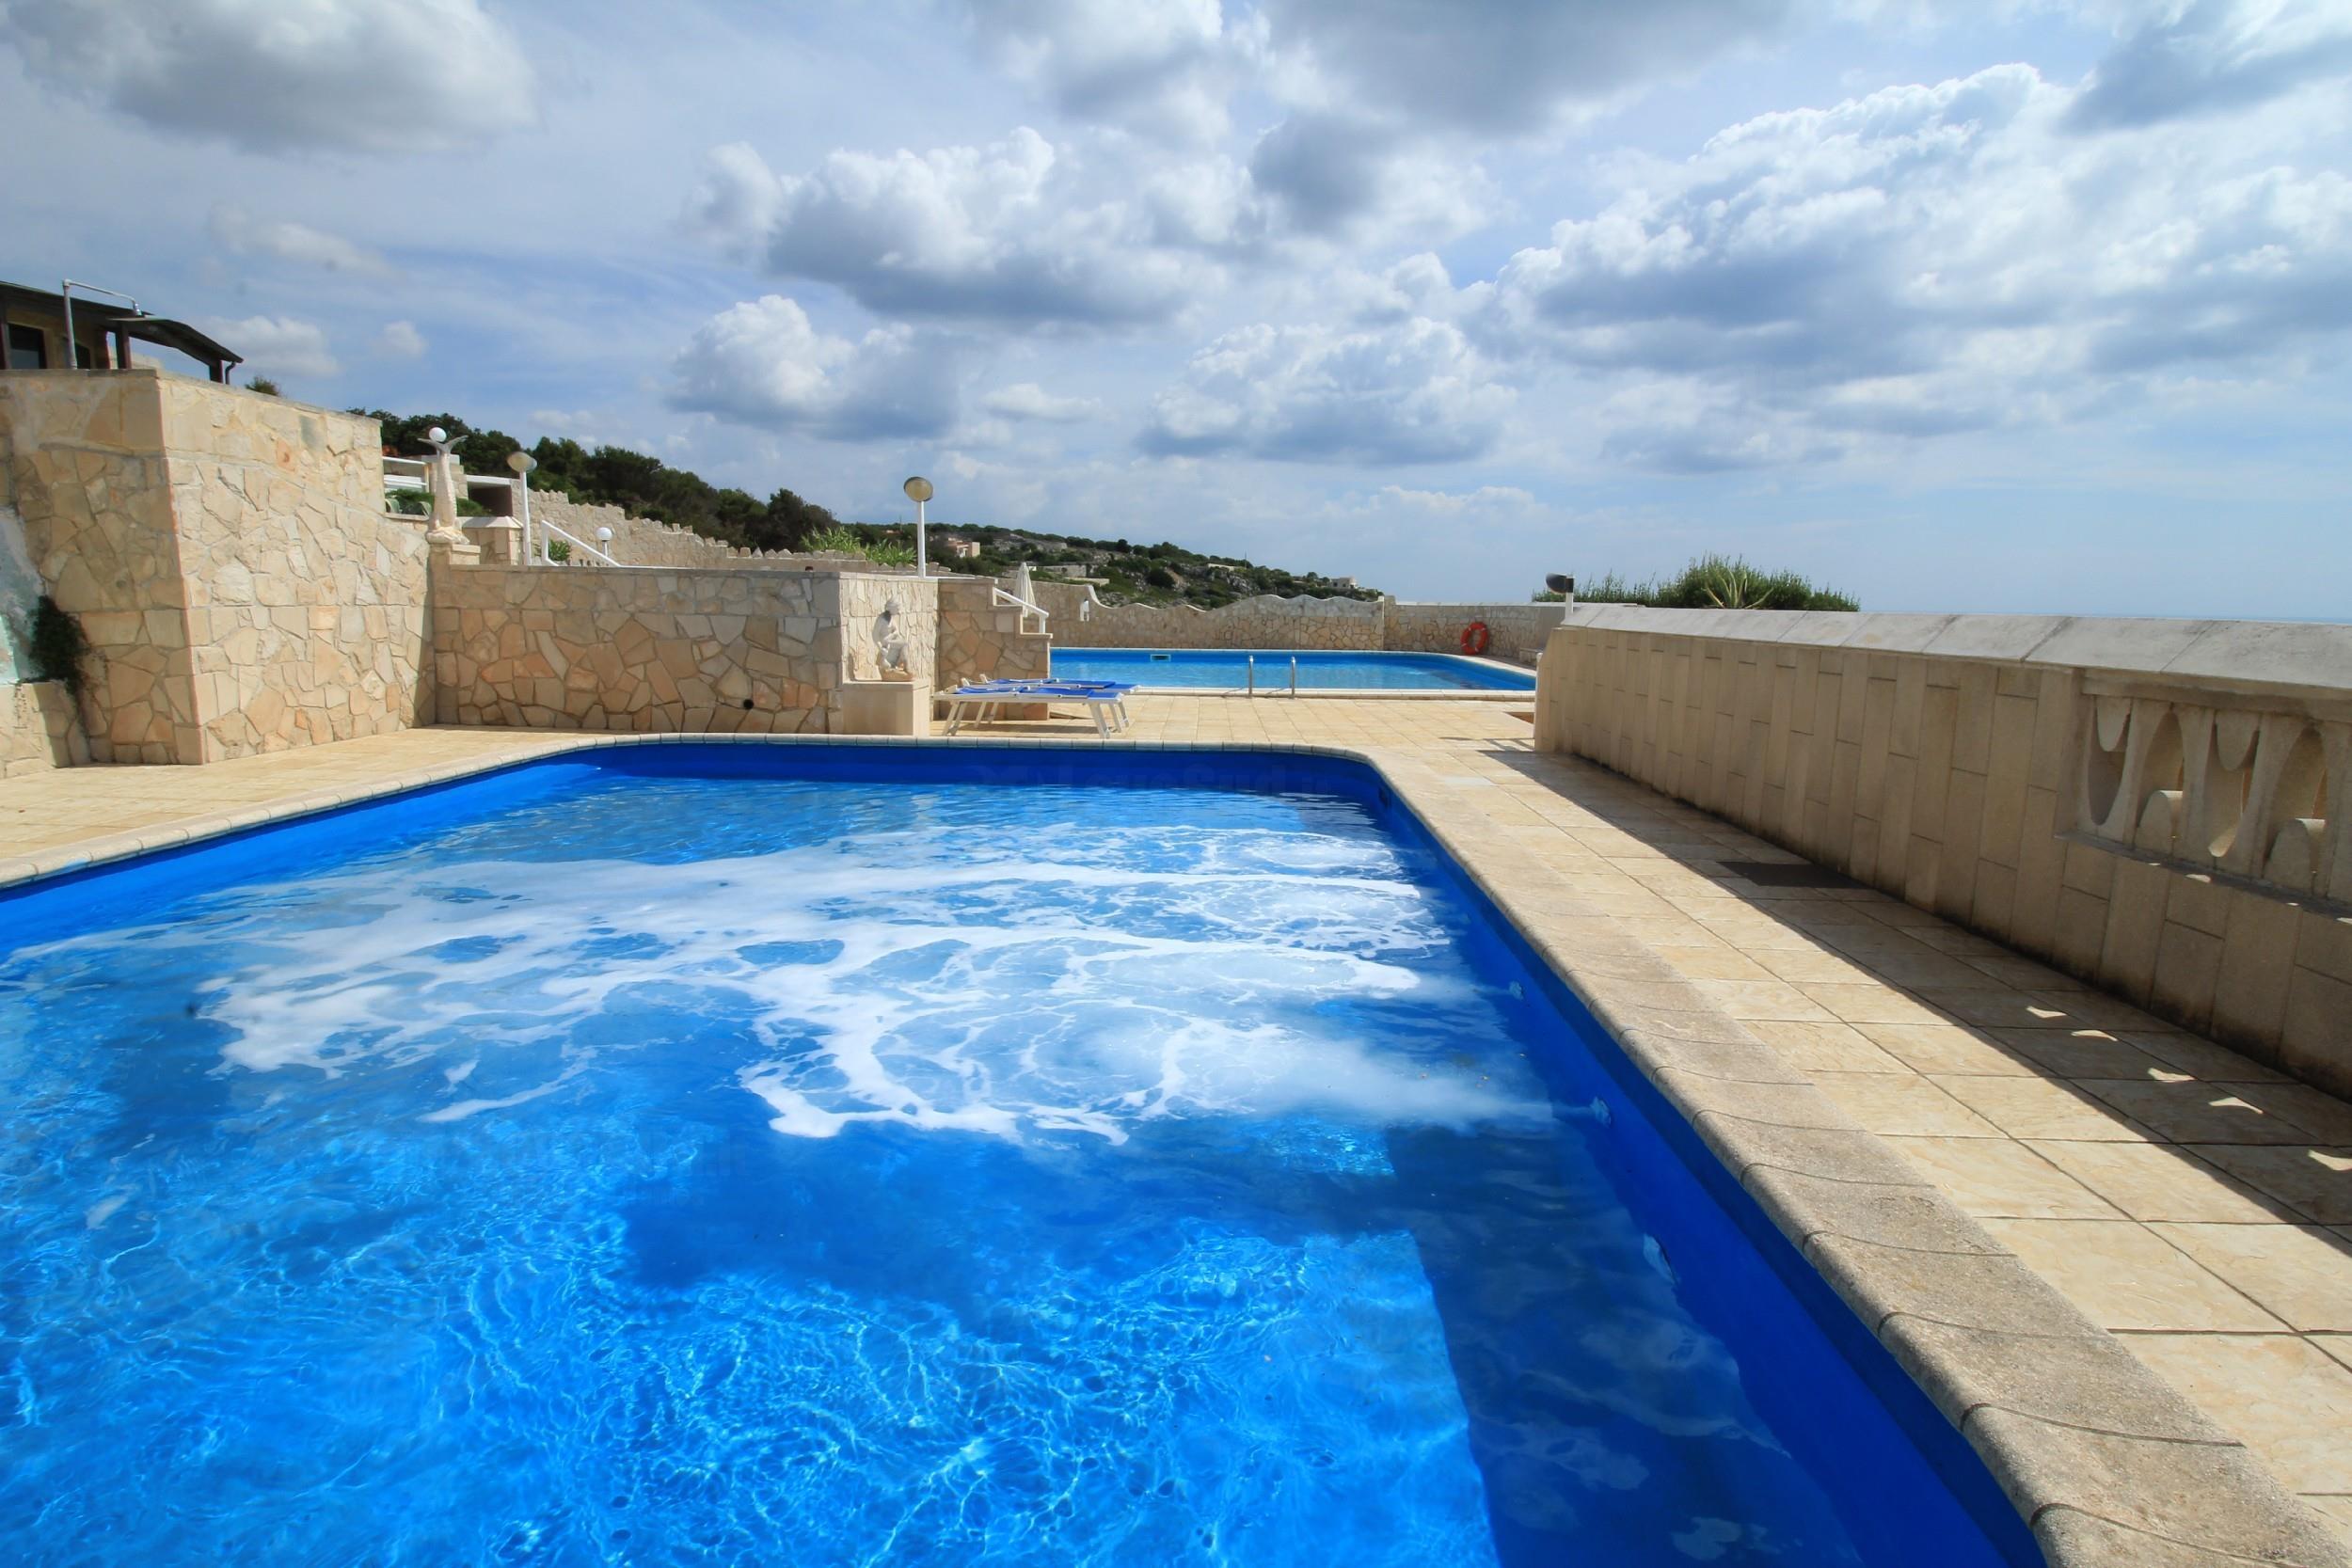 Archetti pool residence photo 22460061